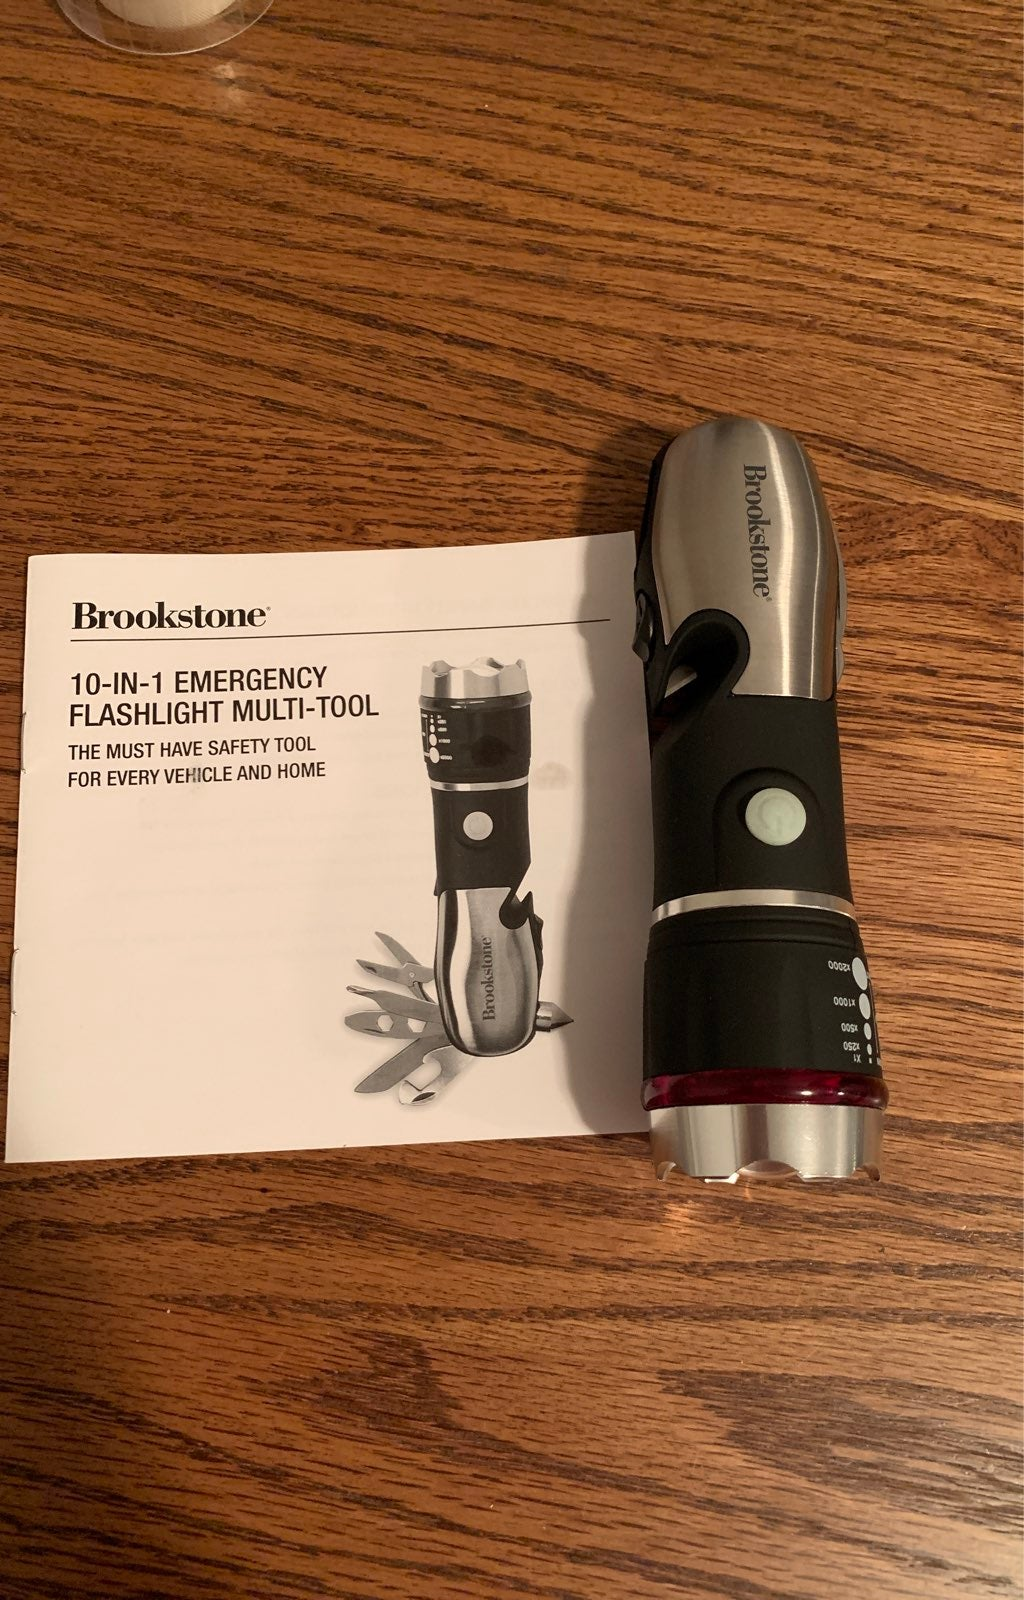 Brookstone emergency flashlight multi to